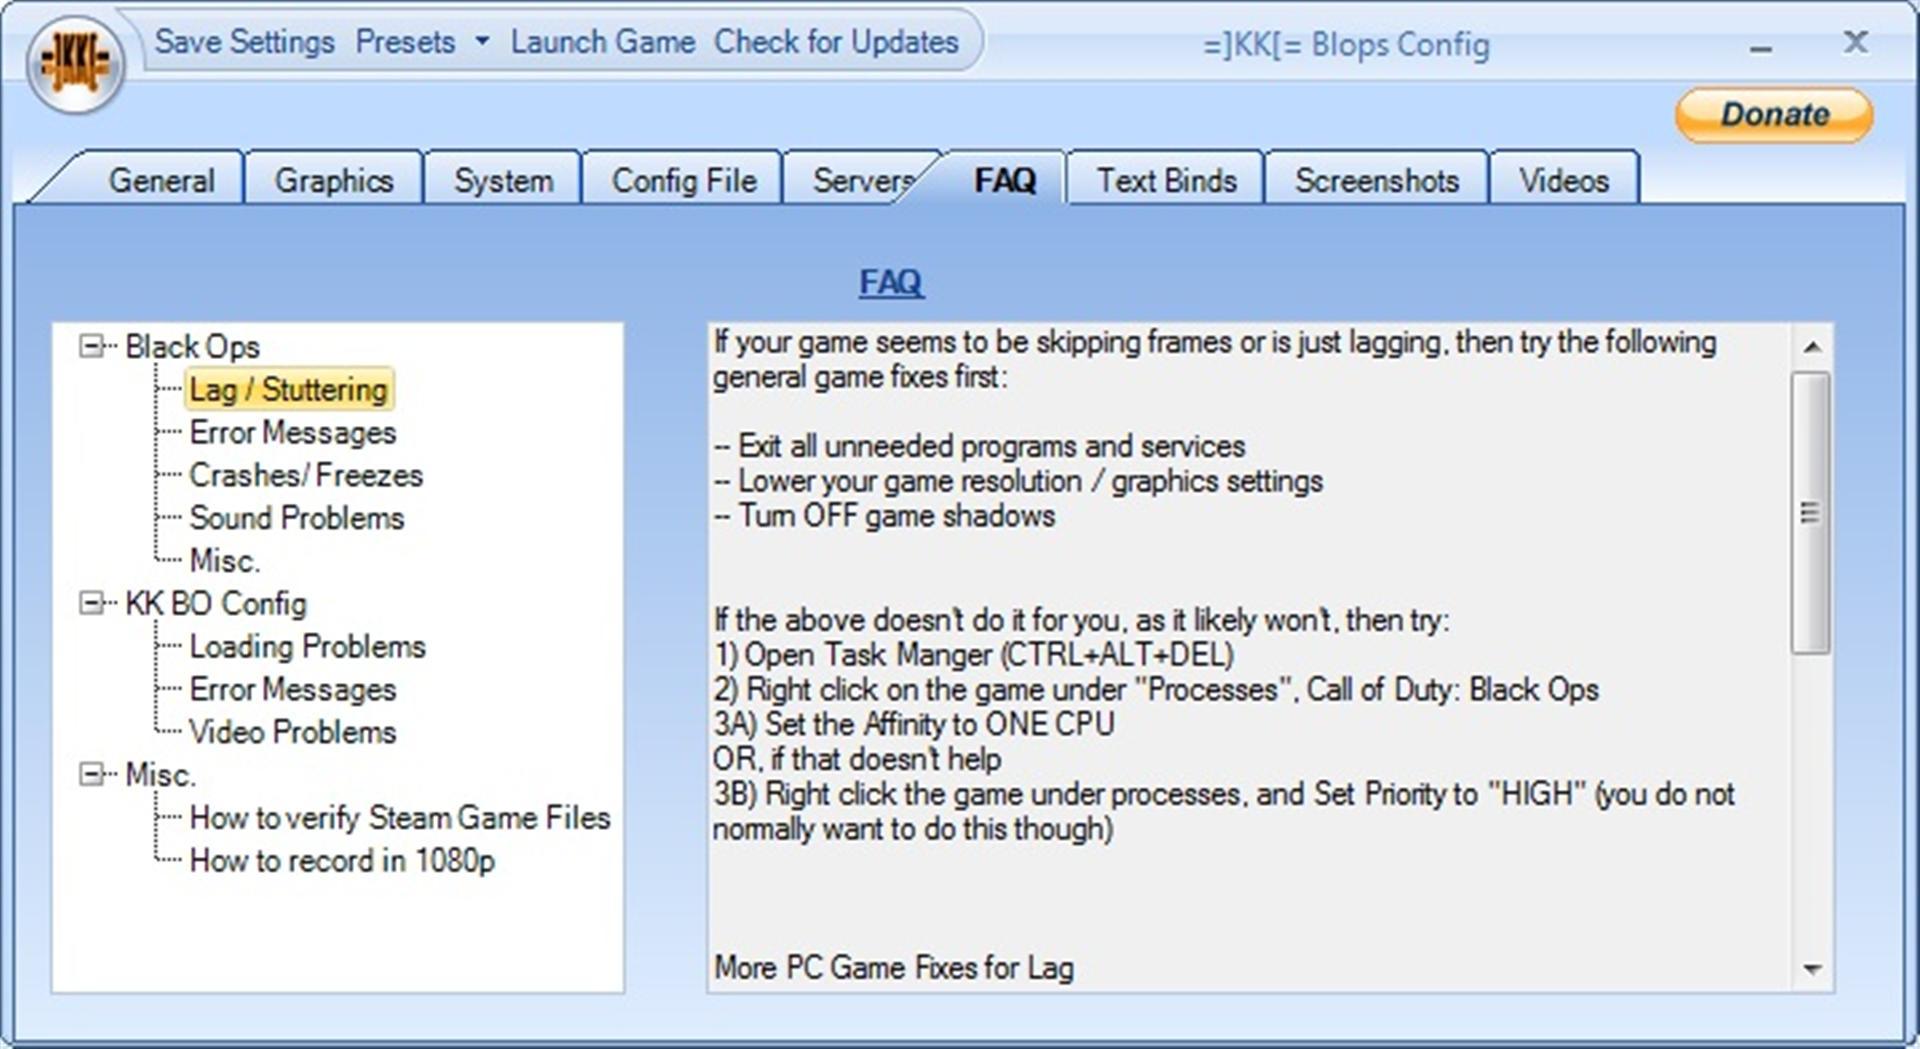 KK[= BO Config Tool Preview Screens image - Mod DB